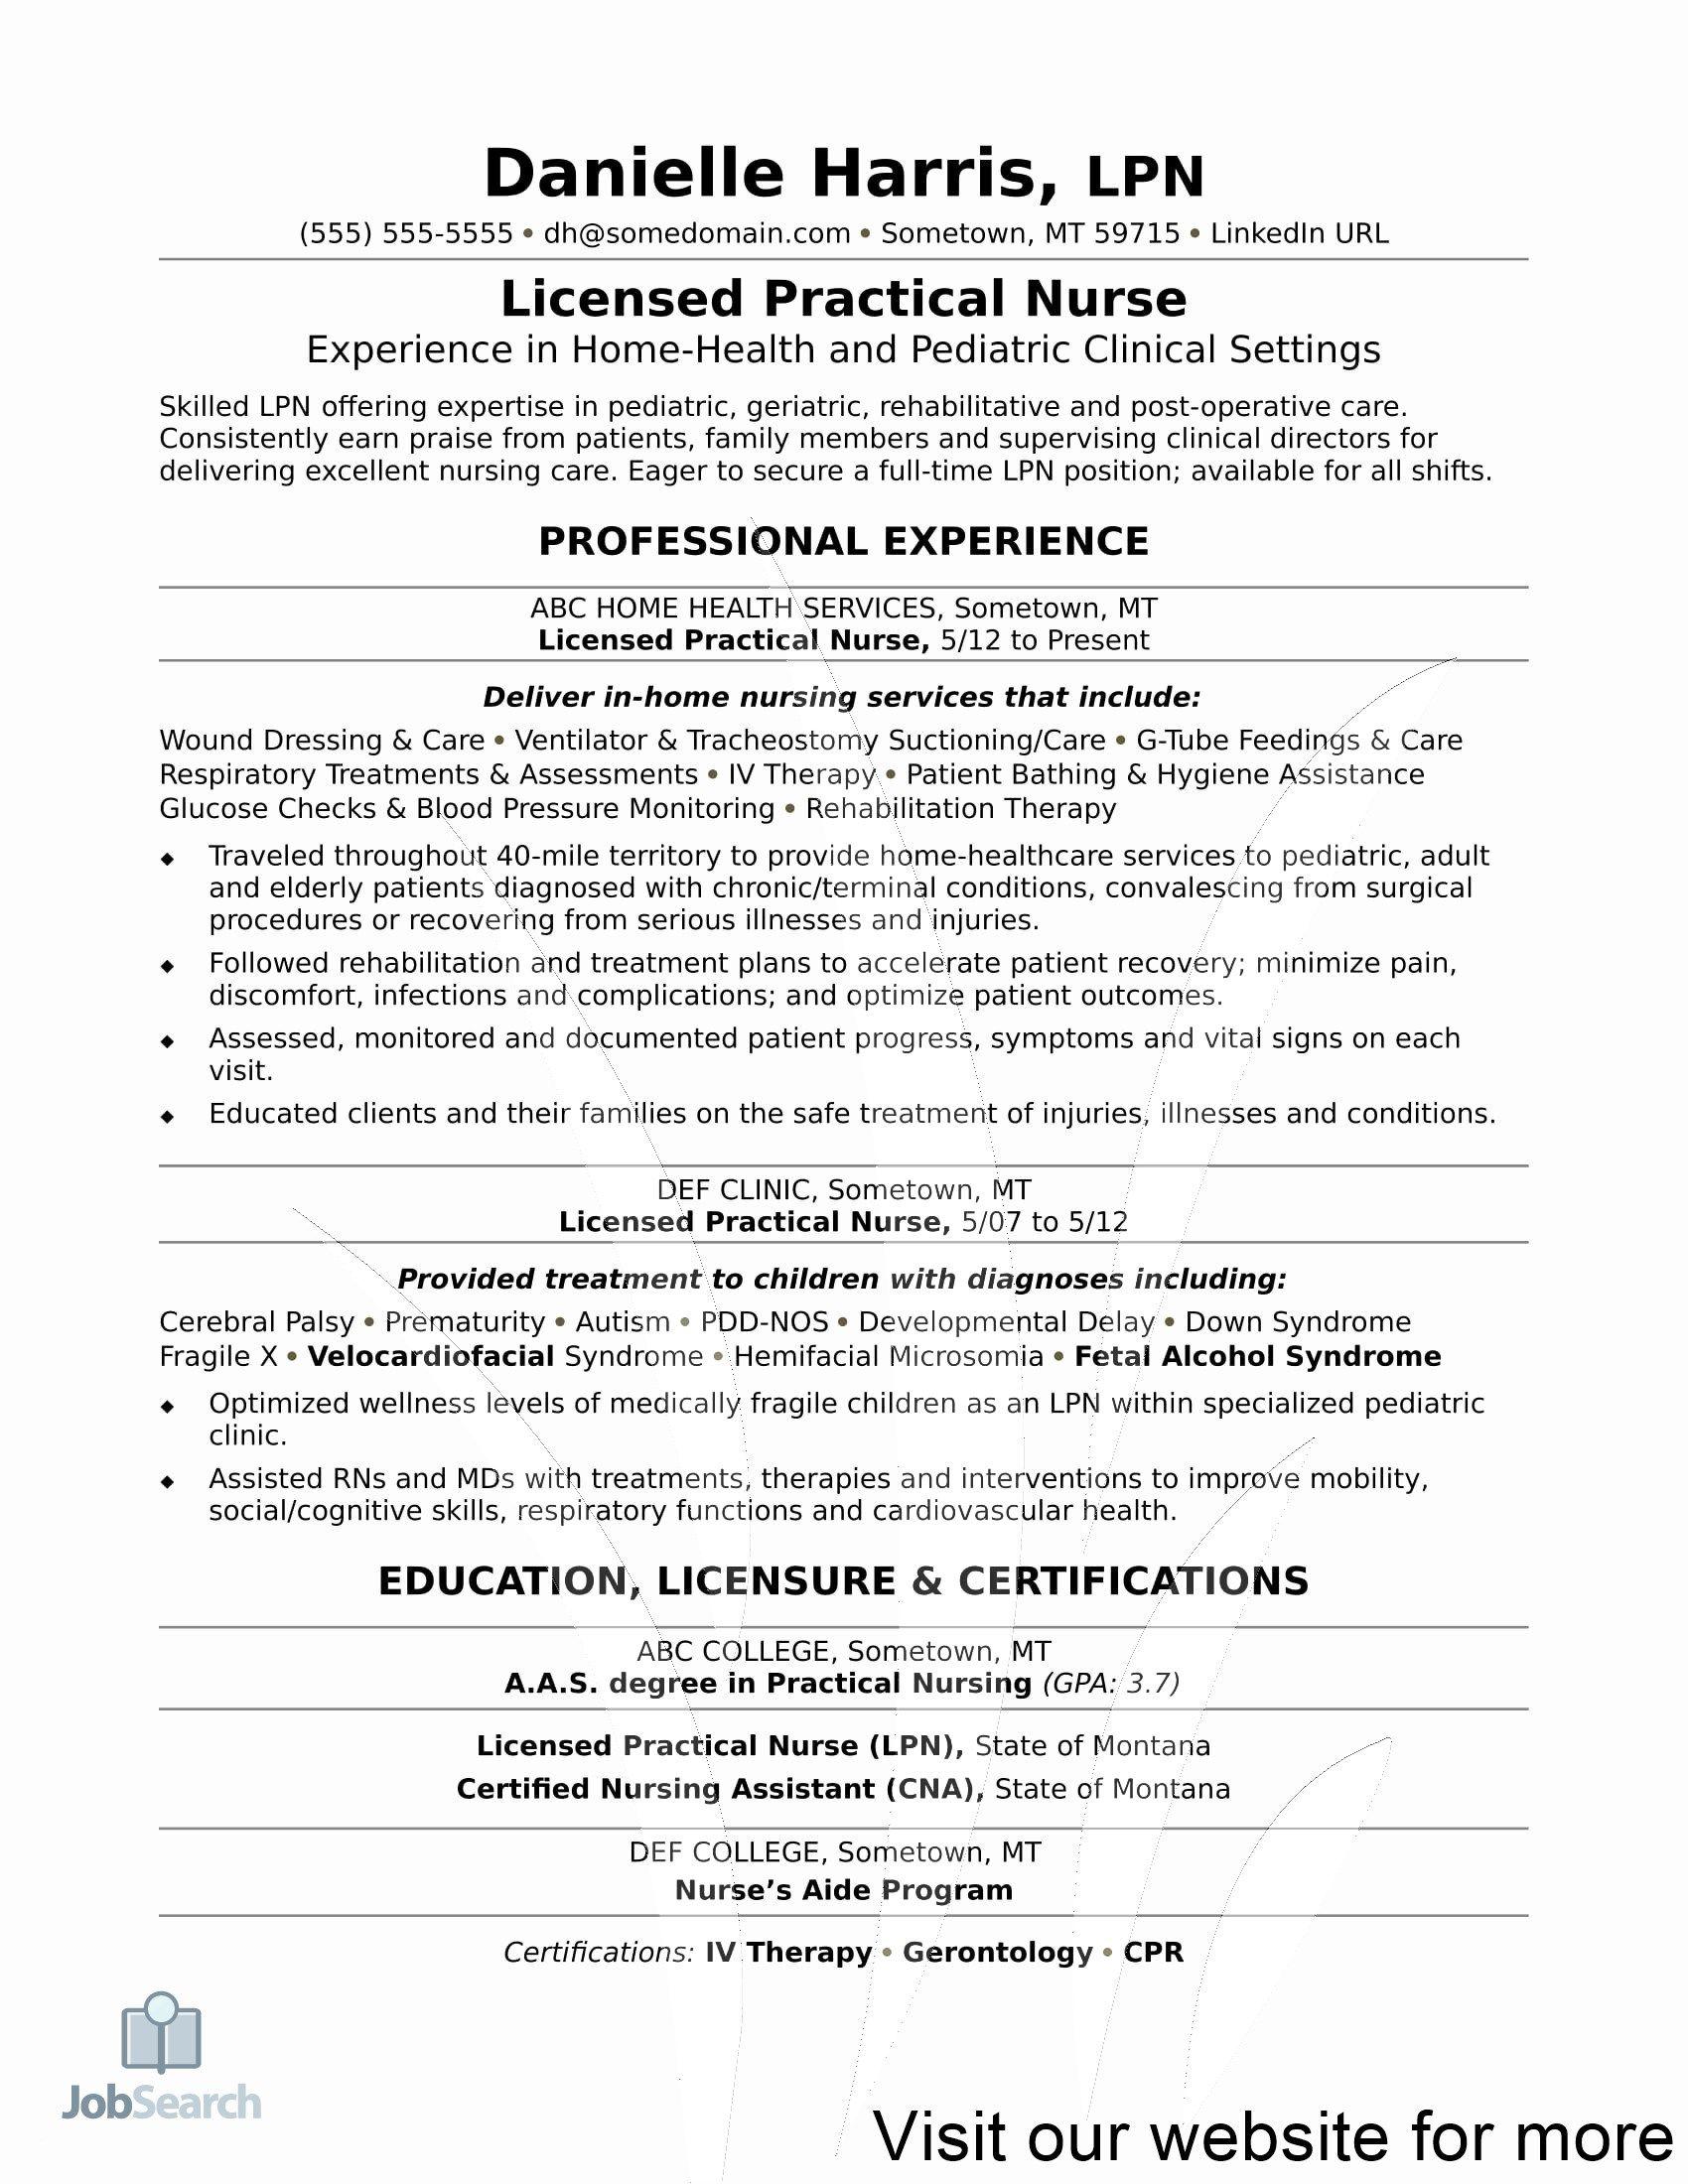 resume builder app for pc Professional in 2020 Nursing